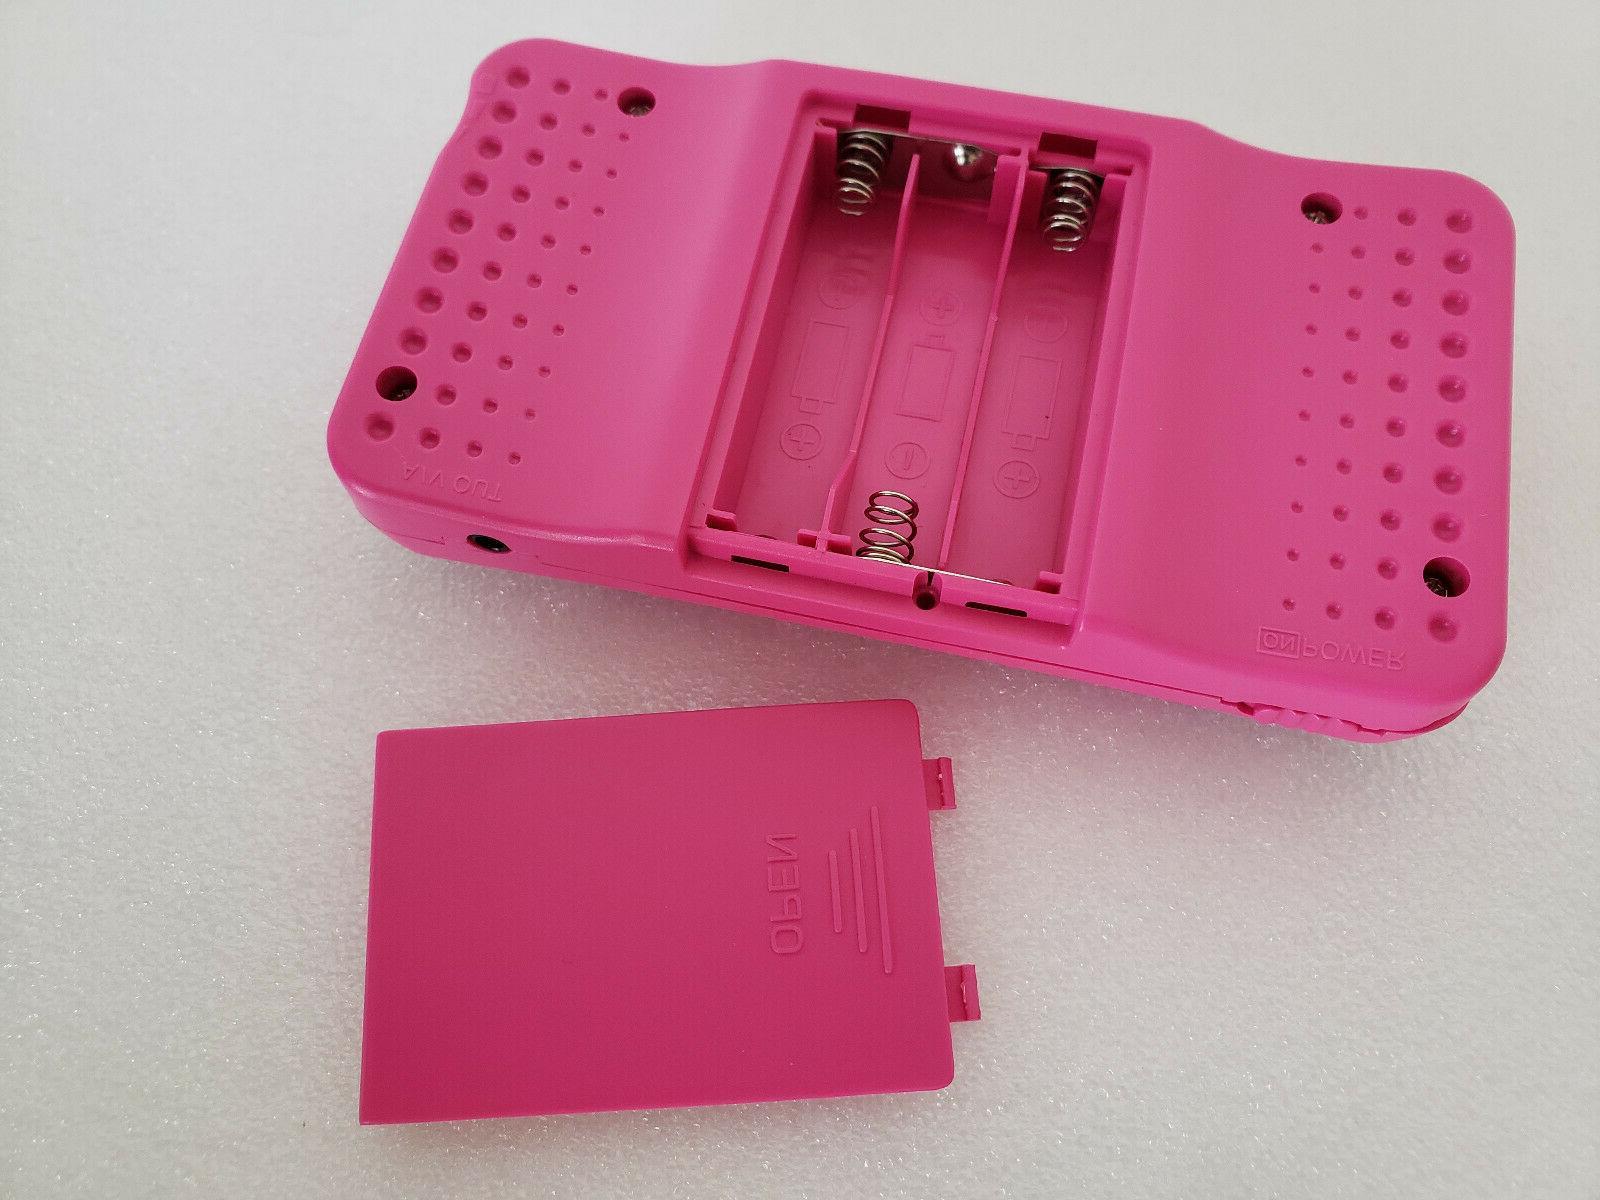 "QingShe Handheld for 2.5"" LCD Built in Games"